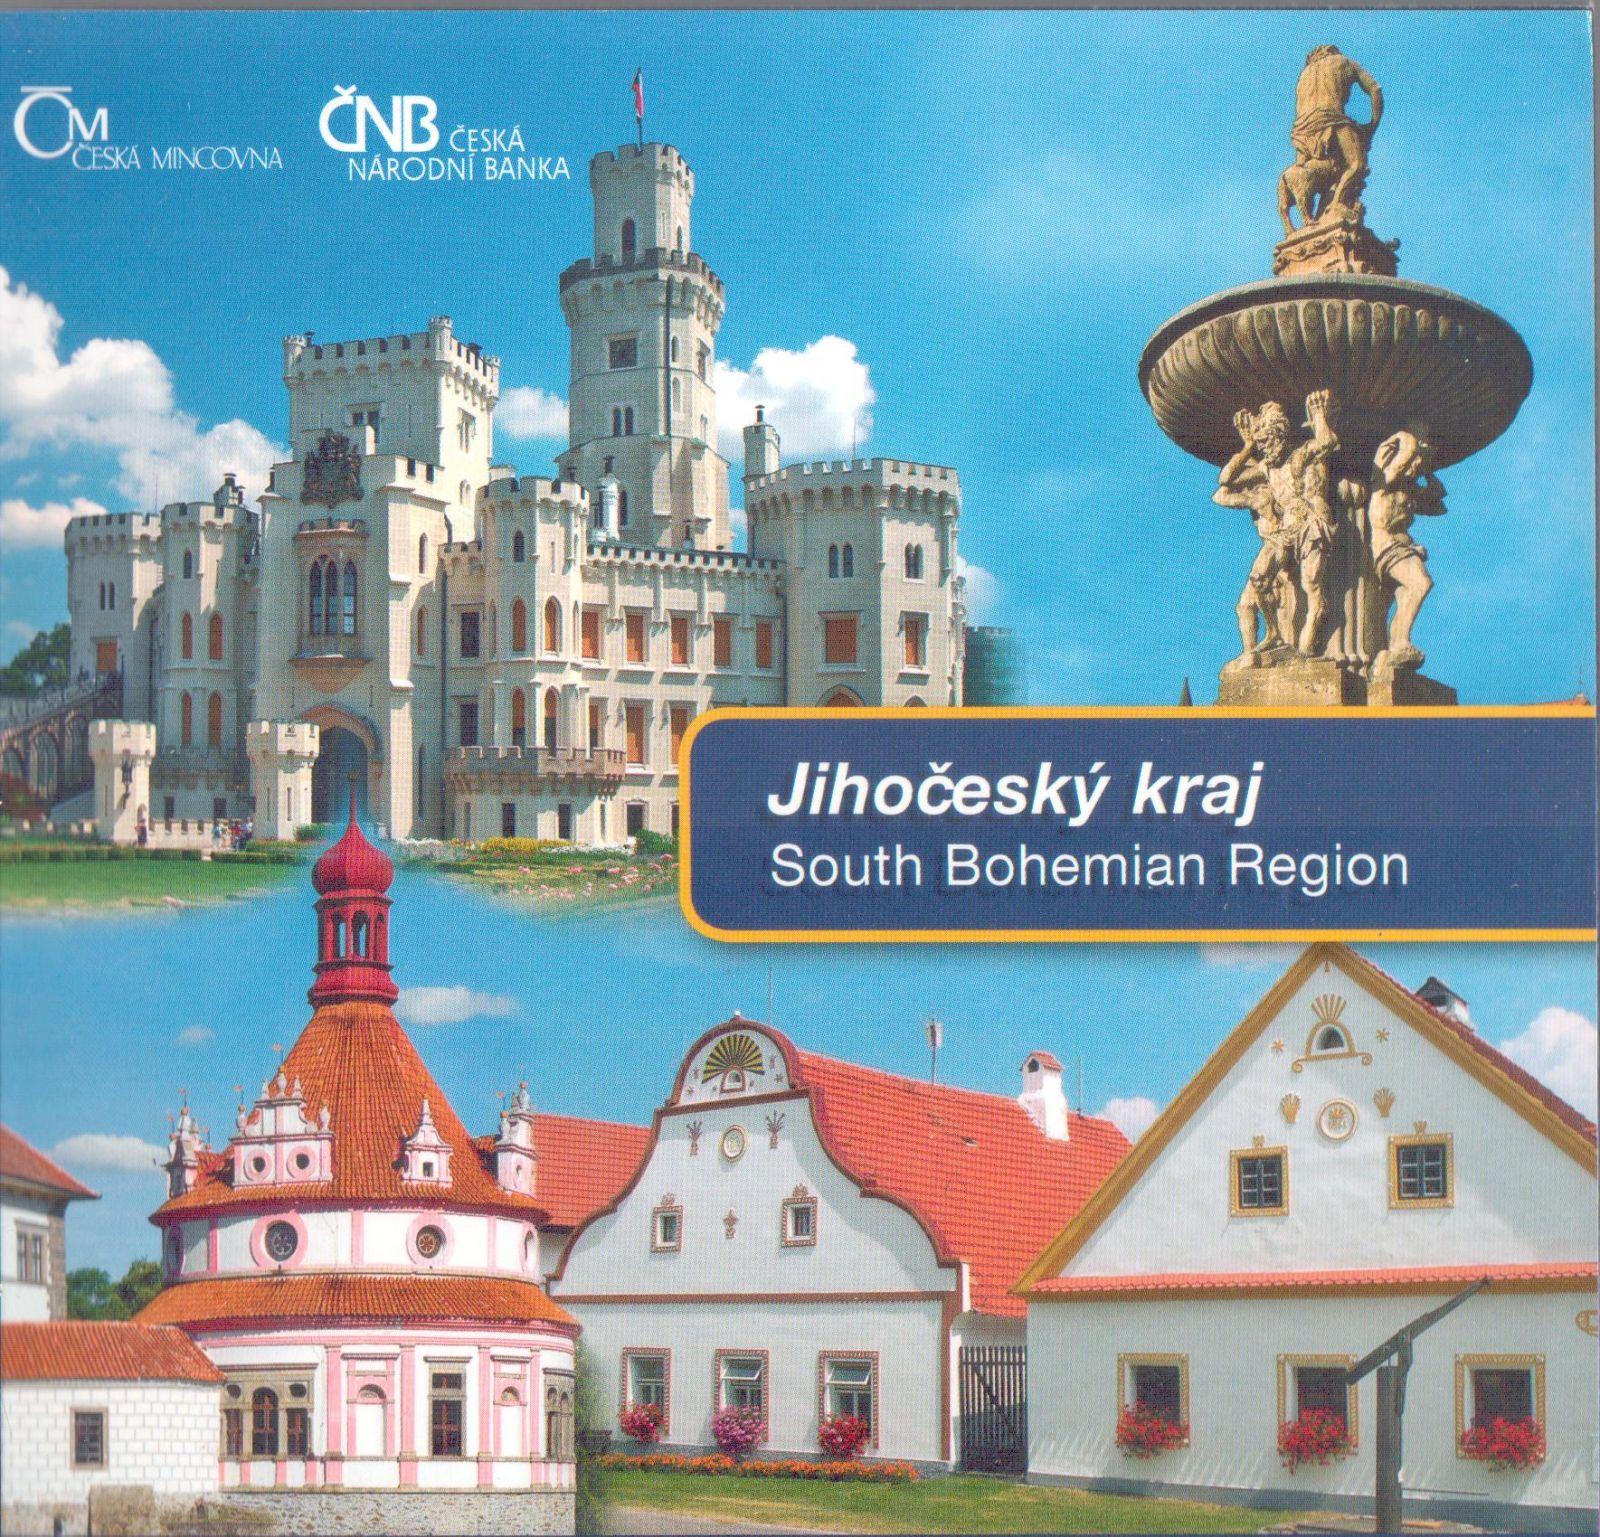 Ročníková sada oběžných mincí ČR (2009-Jihočeský kraj), stav 0/0